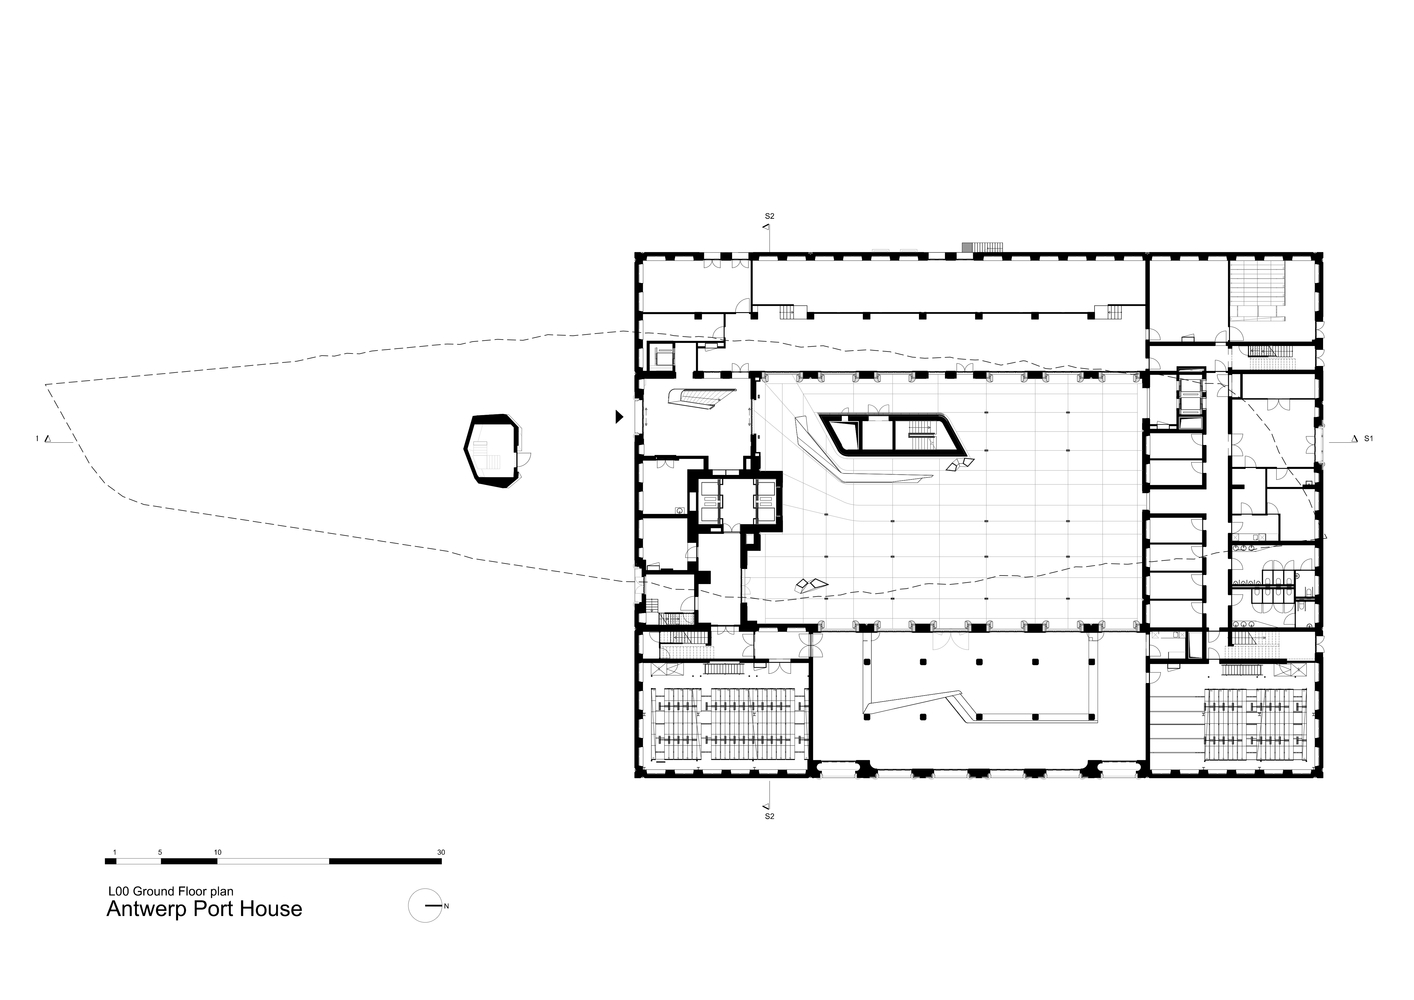 Gallery of antwerp port house zaha hadid architects 29 antwerp port houselevel 0 floor plan pooptronica Image collections